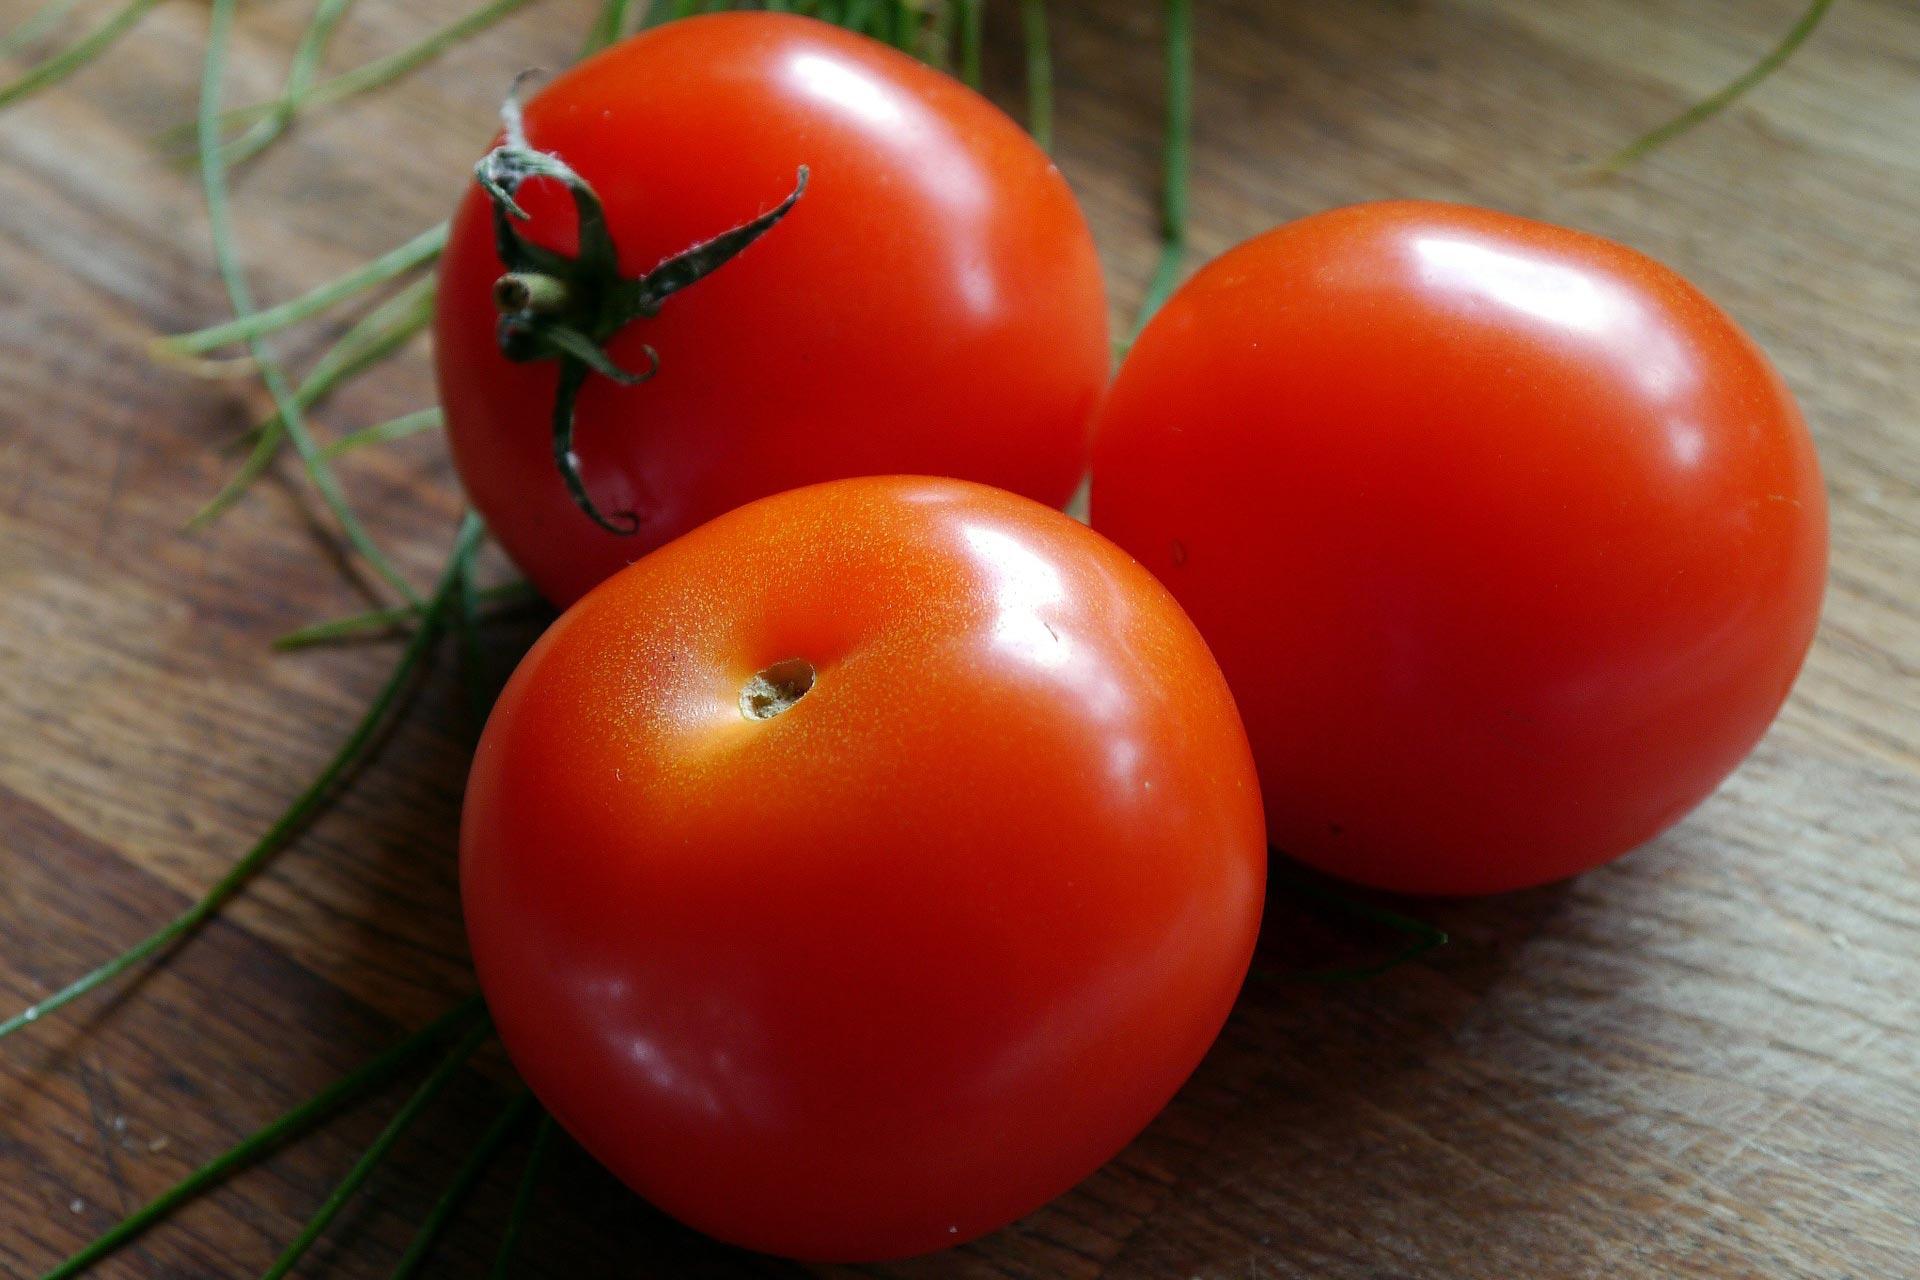 tomato-498721_1920.jpg